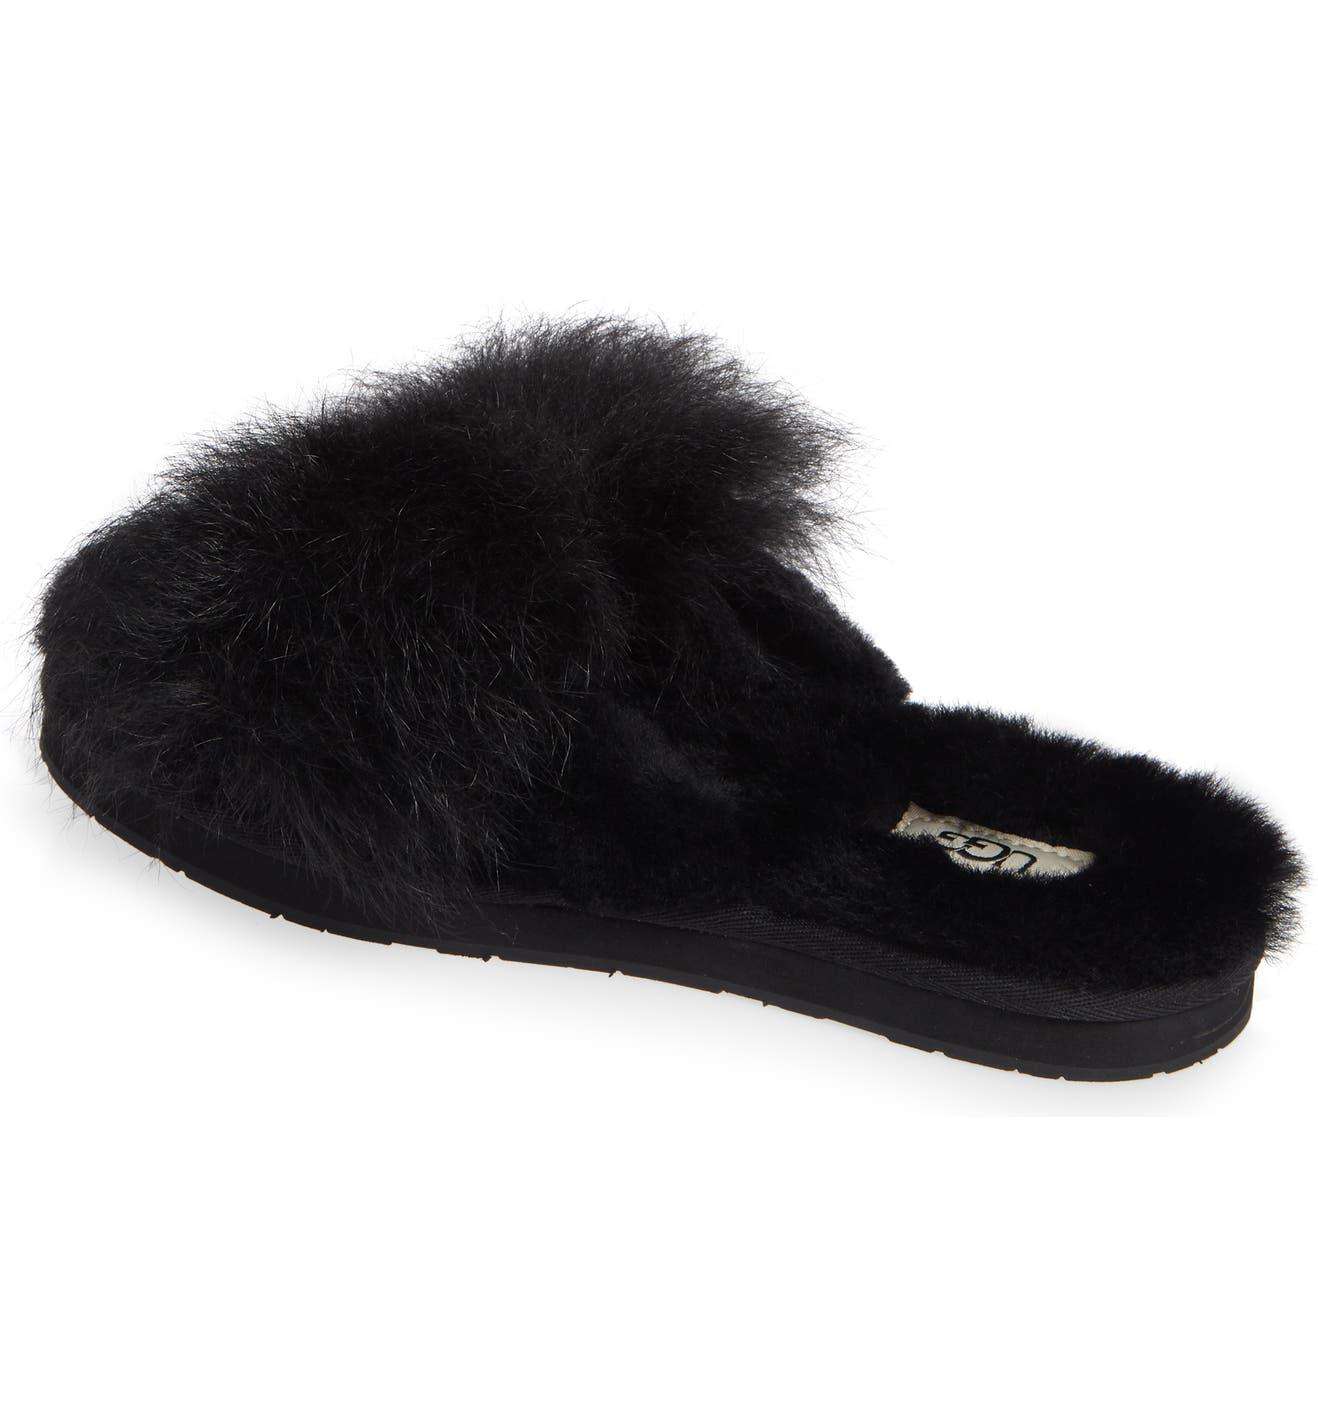 a46169fe14 UGG® Mirabelle Genuine Shearling Slipper (Women)